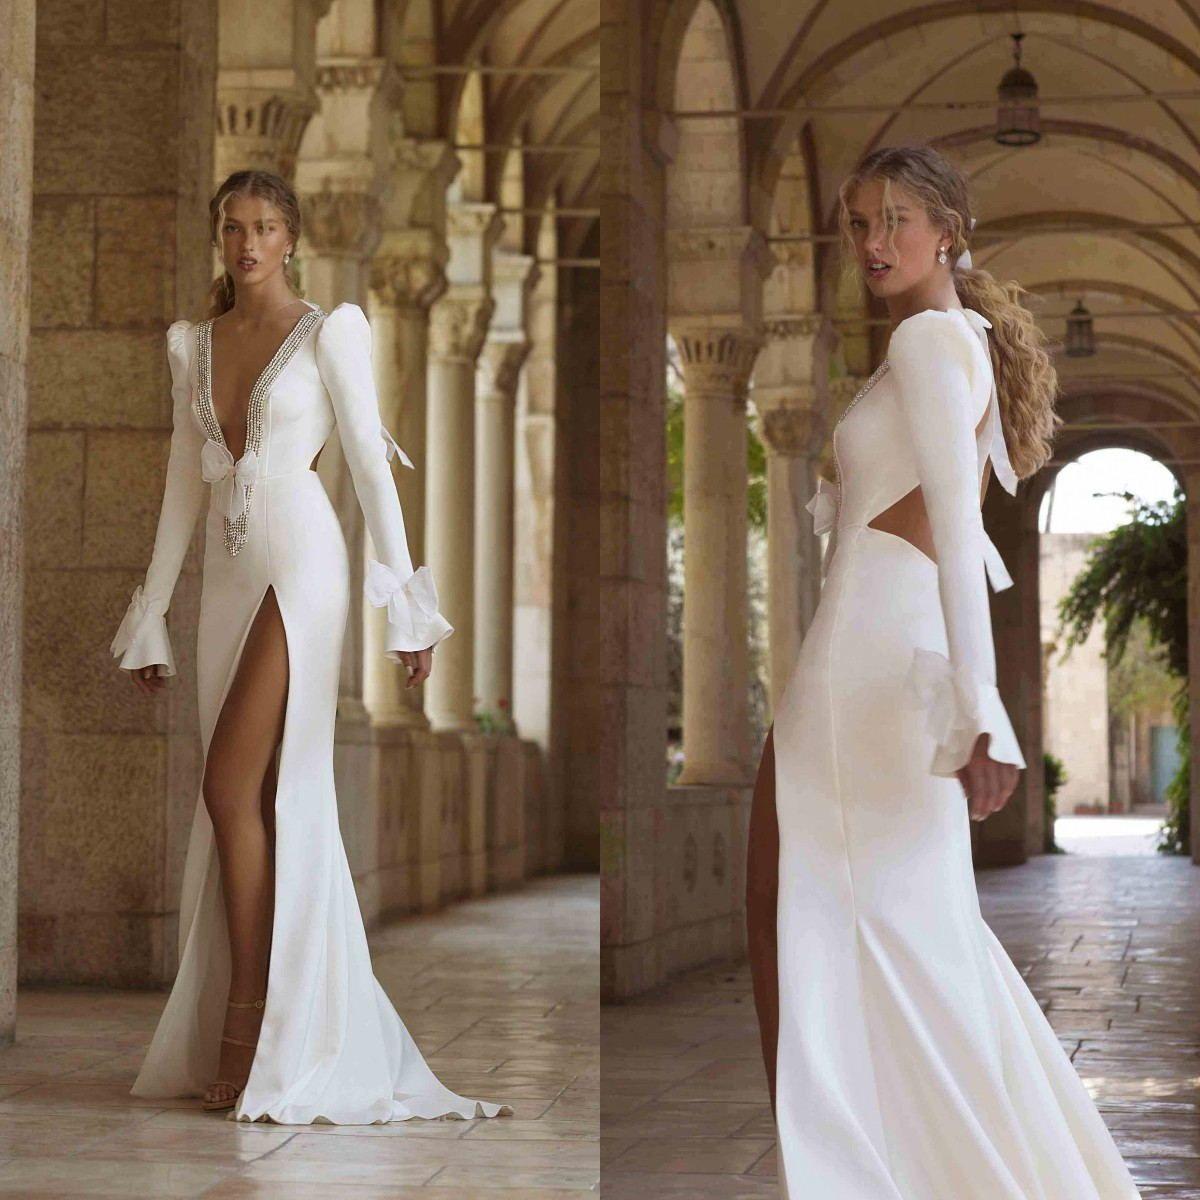 Elegante satén vestido de boda sexy profundo cuello sirena manga larga vestido nupcial lado lado split vestidos de novia